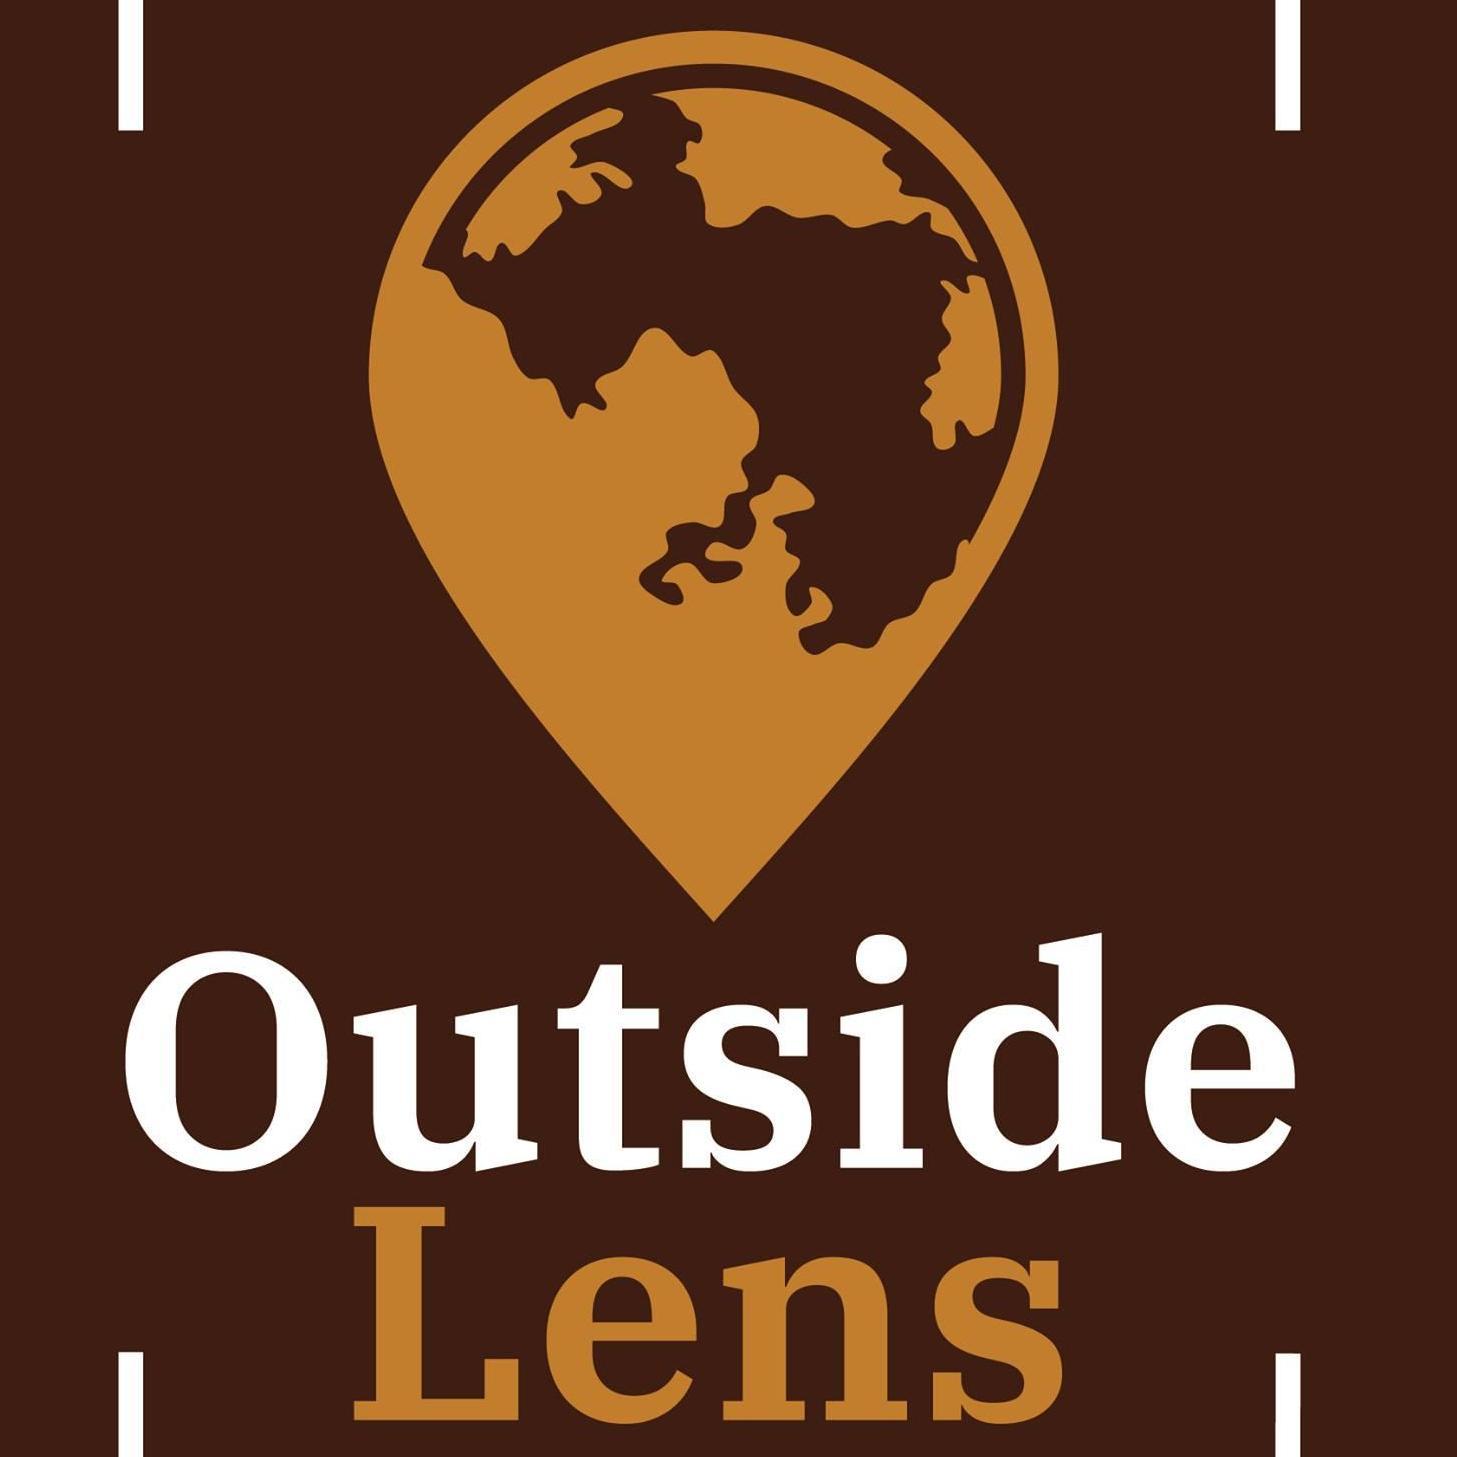 OutsideLens